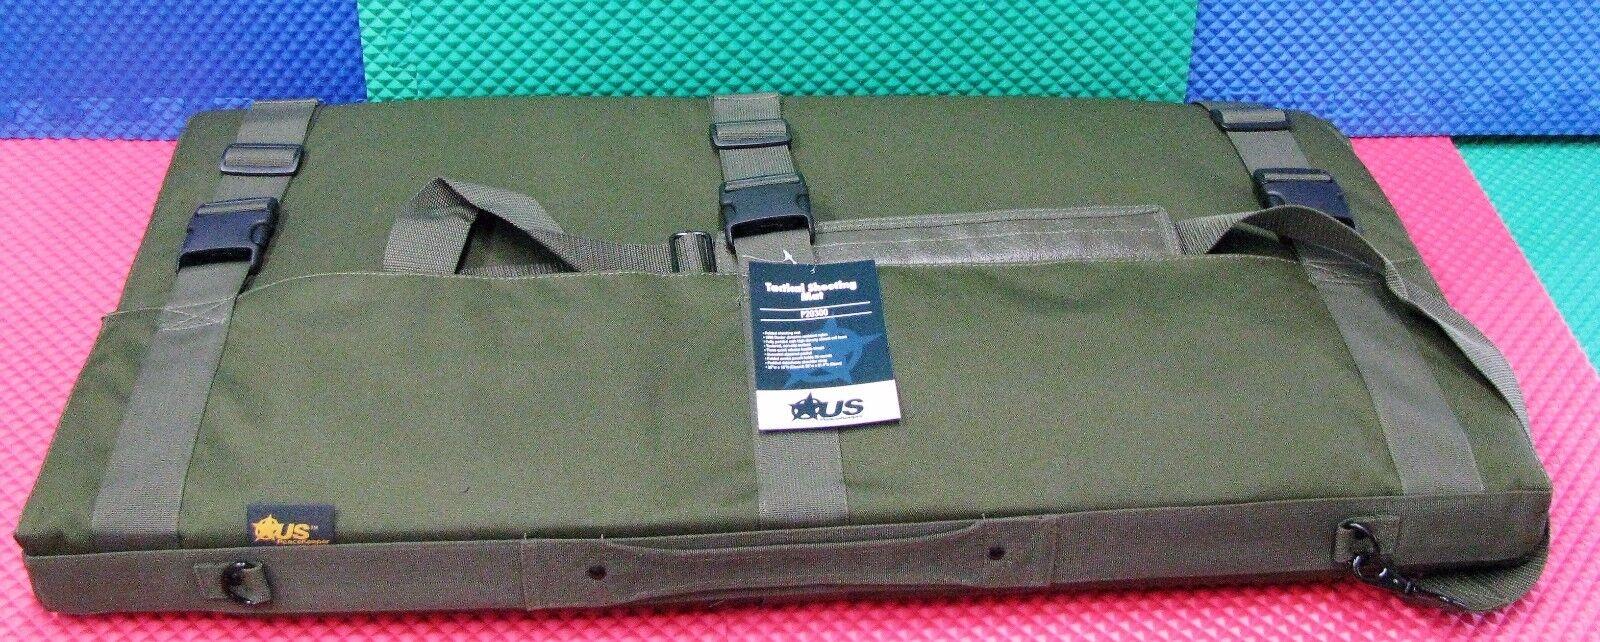 US PeaceKeeper Tactical Shooting Mat OD Green Water Resistant P20300